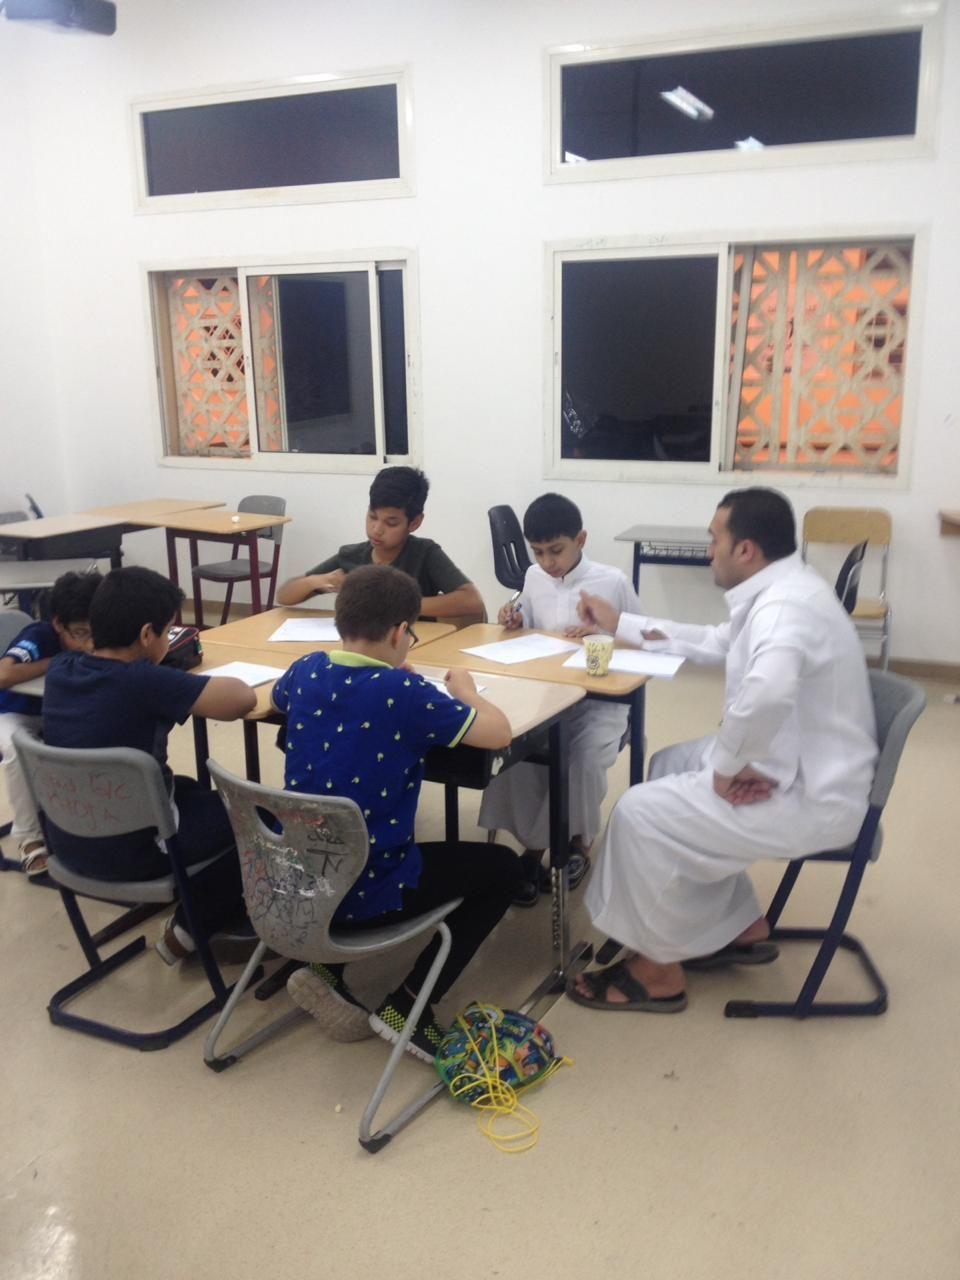 Pin By مدارس منارات الرياض On تدريب الطلاب المتأهلين لنهائي مسابقة موهوب Home Decor Furniture Room